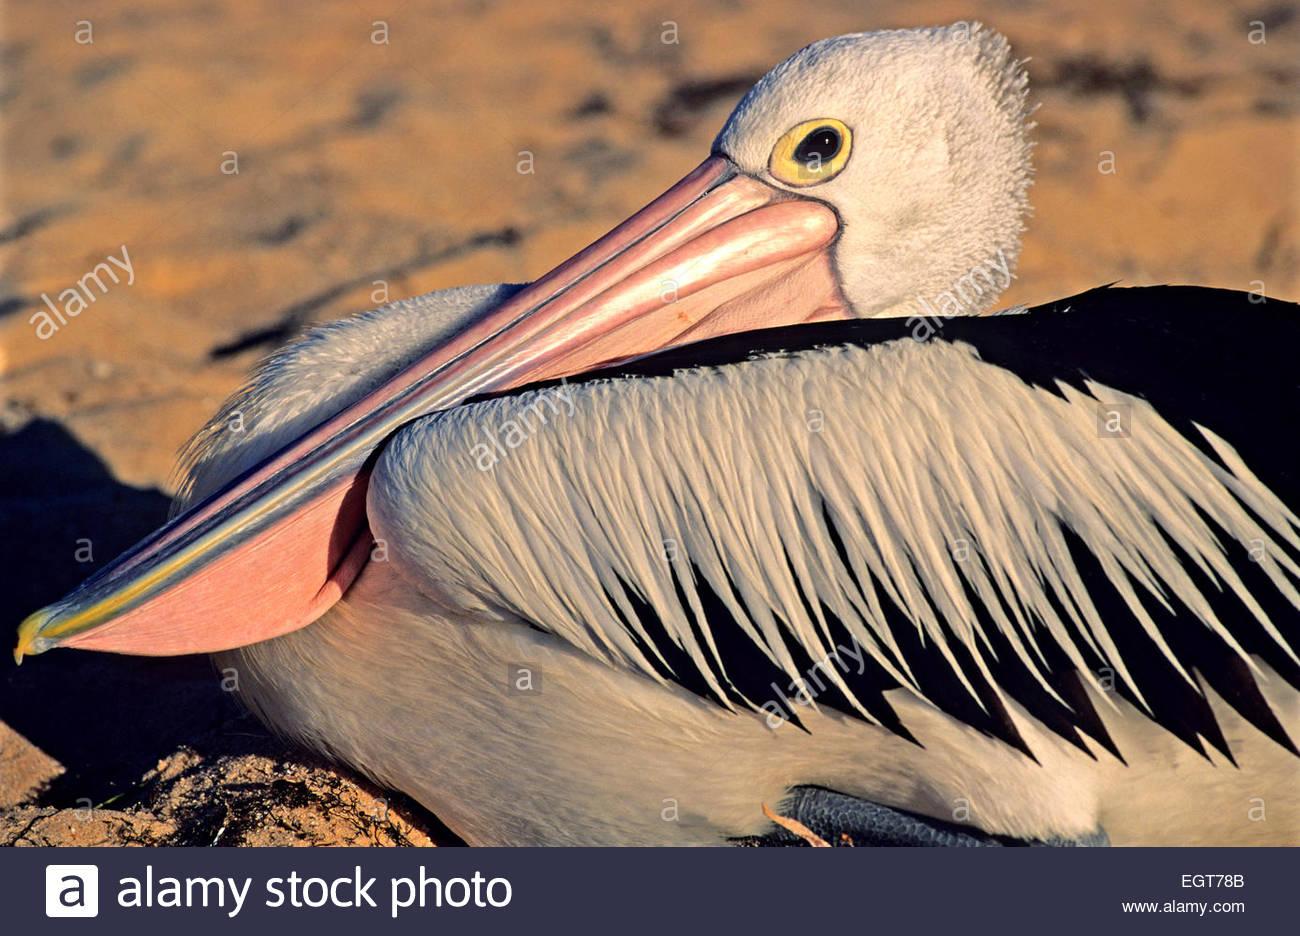 Spectacled pelican, Shark Bay, Western Australia. - Stock Image